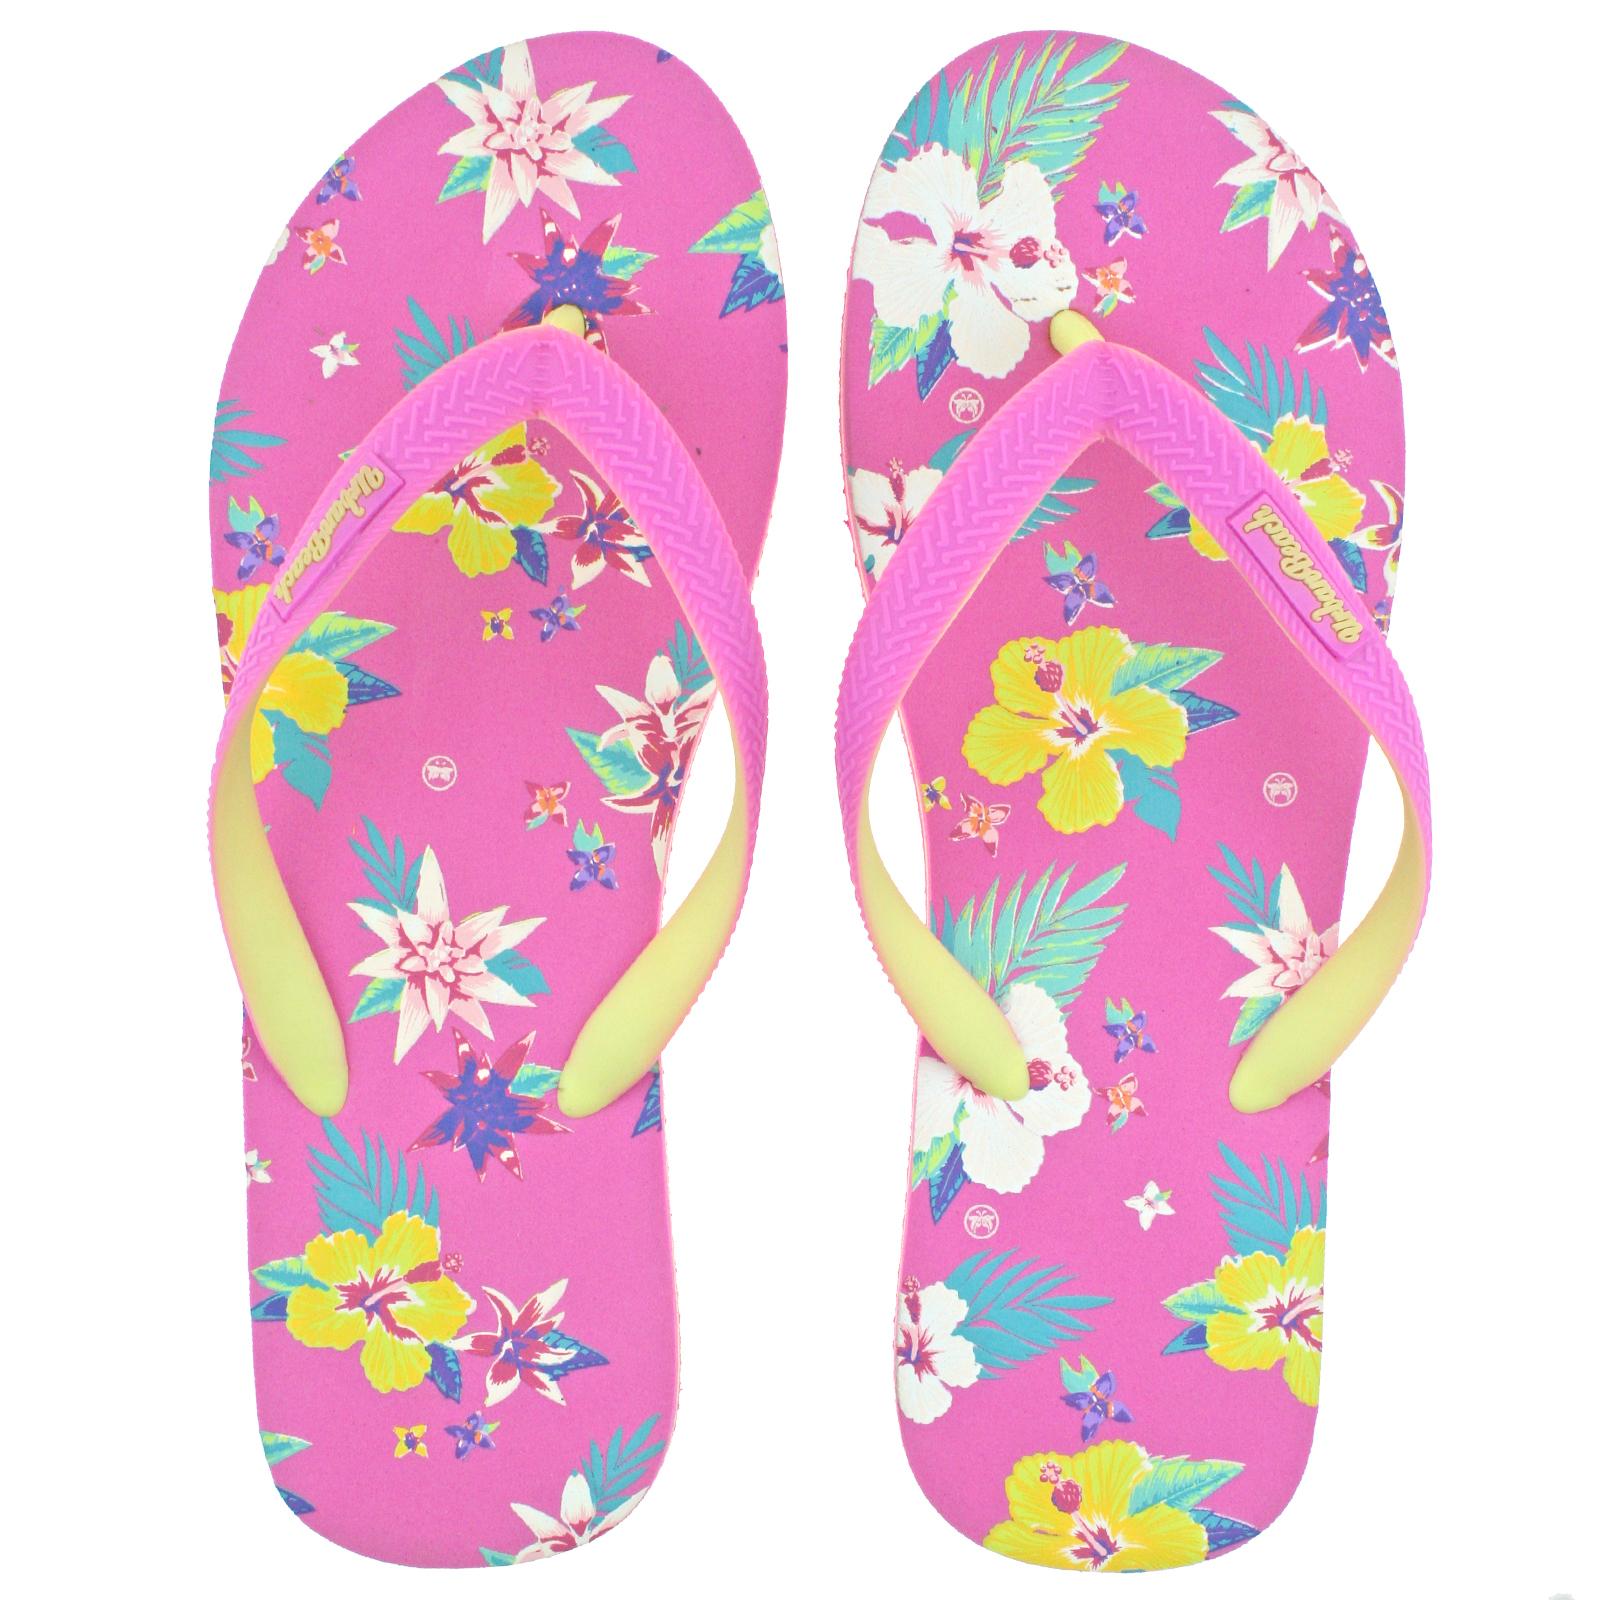 Mujer-Urban-Beach-Bayfront-Playa-Rosa-florado-Chanclas-Sandalias-Tira-en-el-dedo